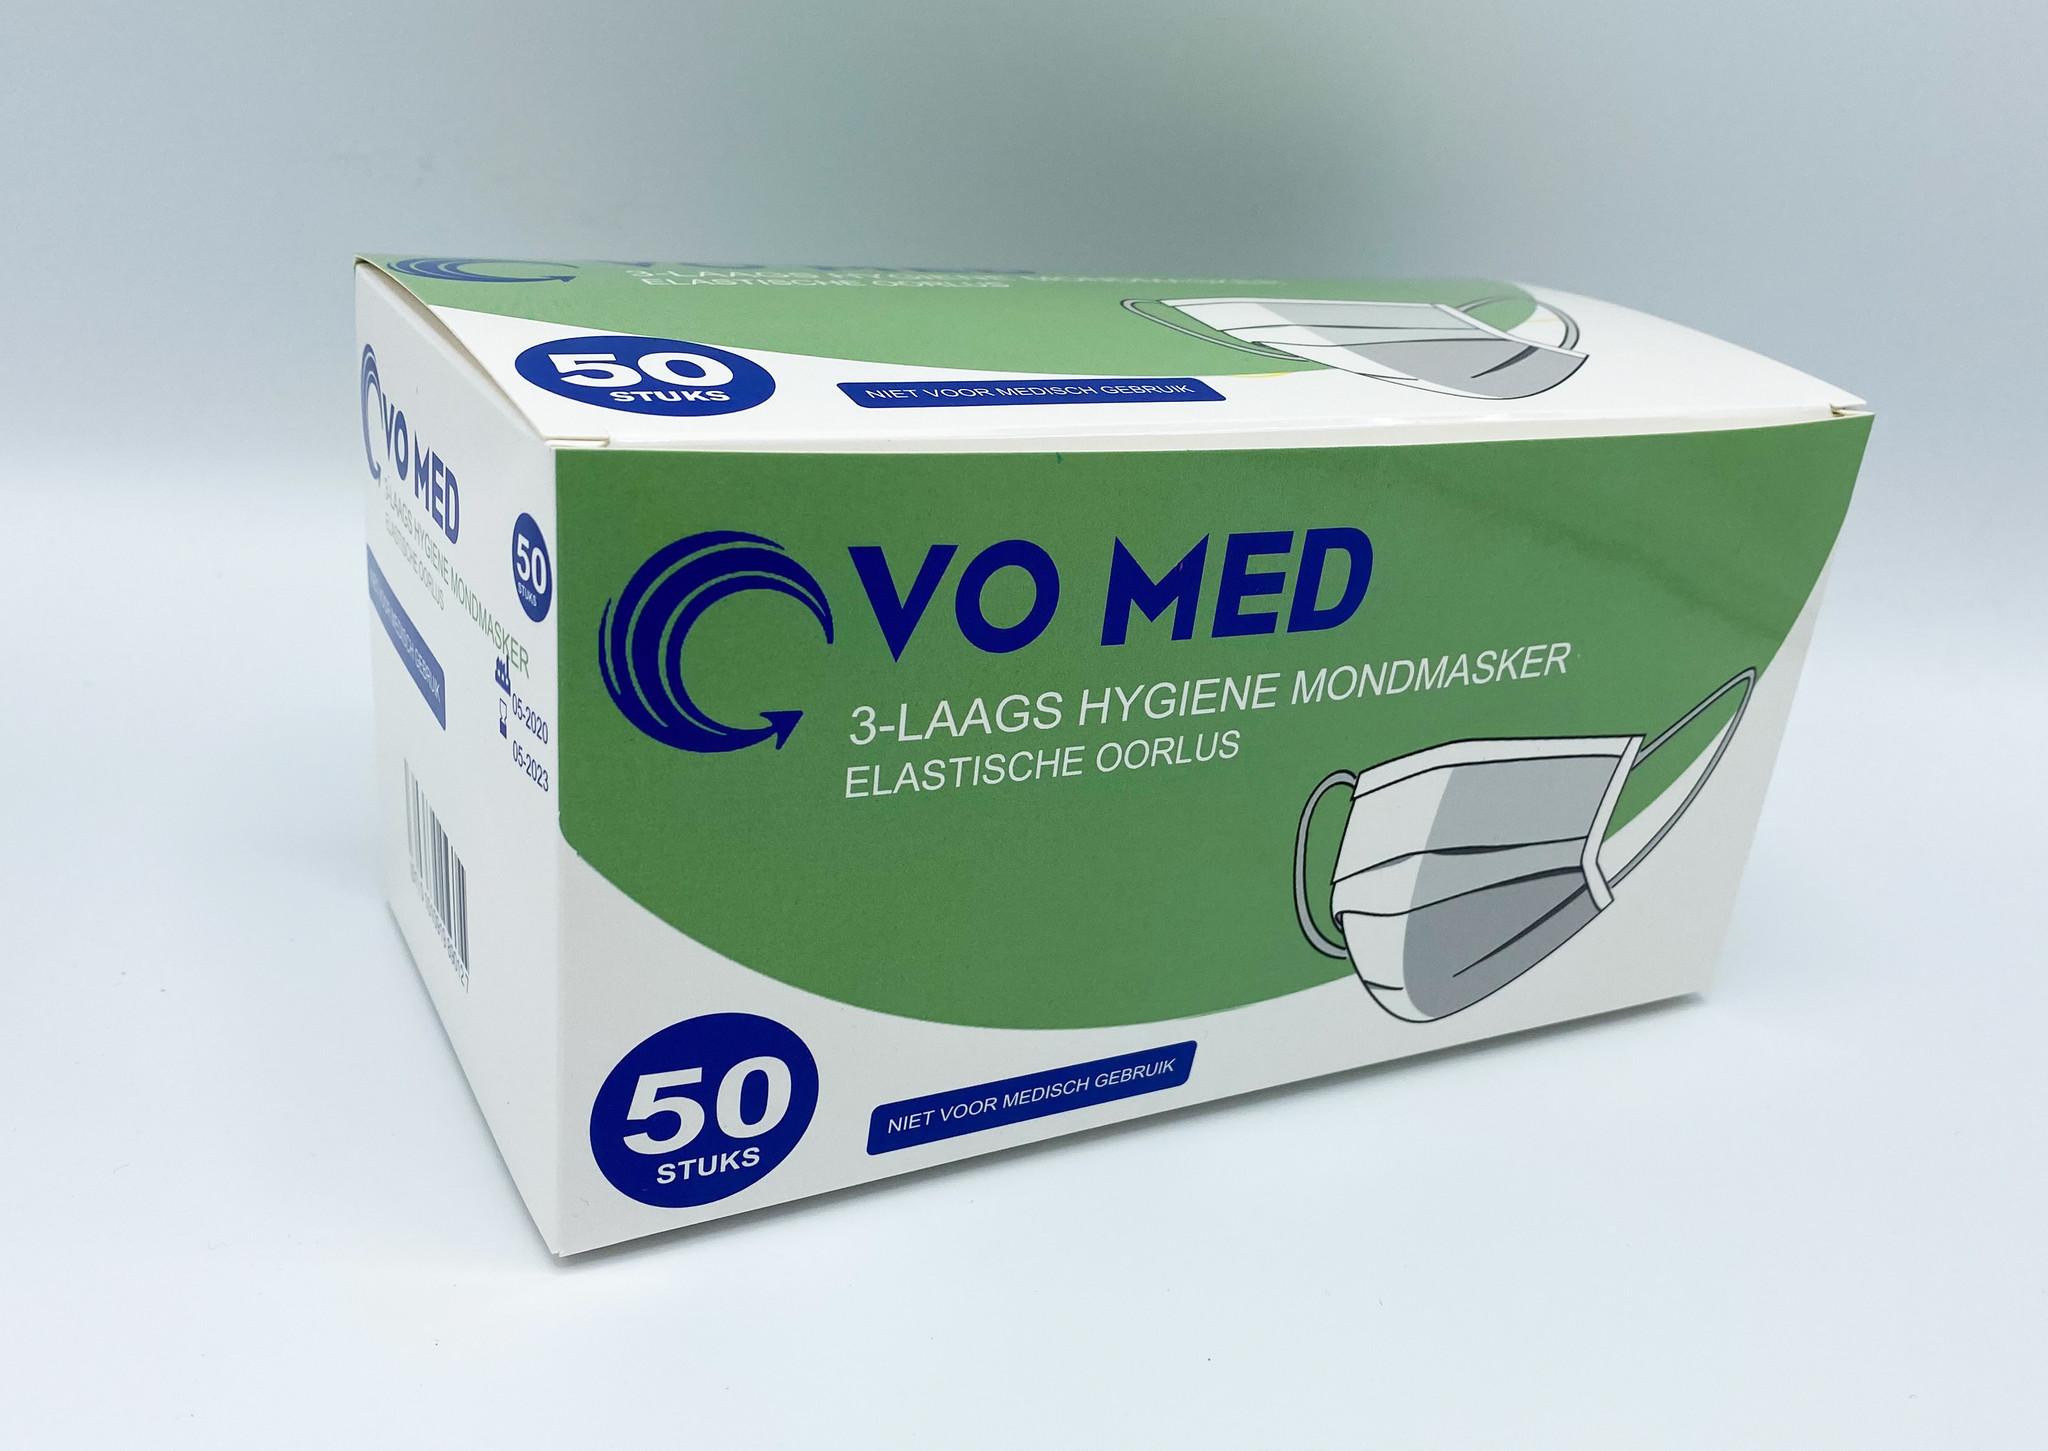 Mondmasker  VO MED type I 3 laags mondkapje, gecertificeerd